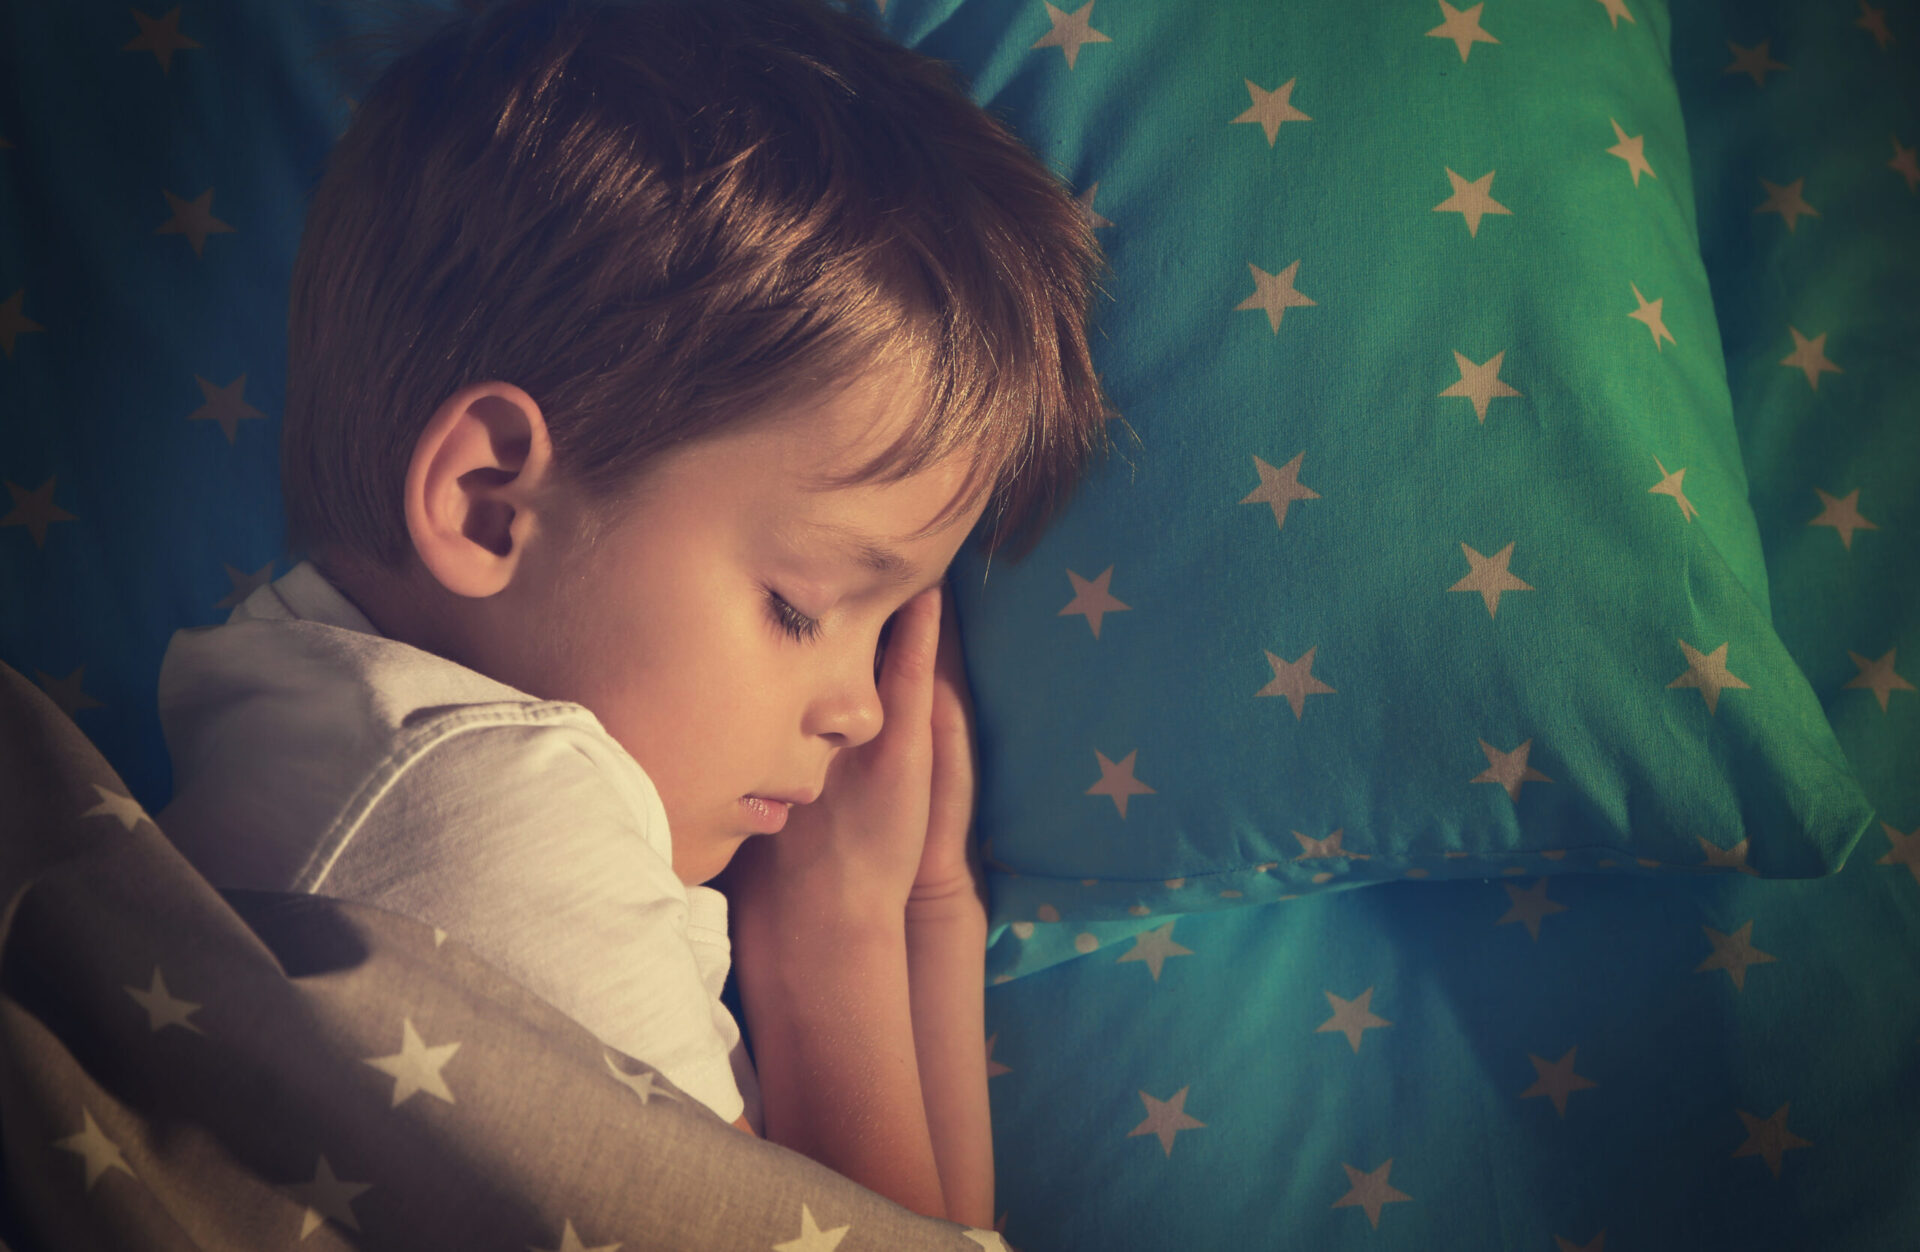 how screentime affects sleep image